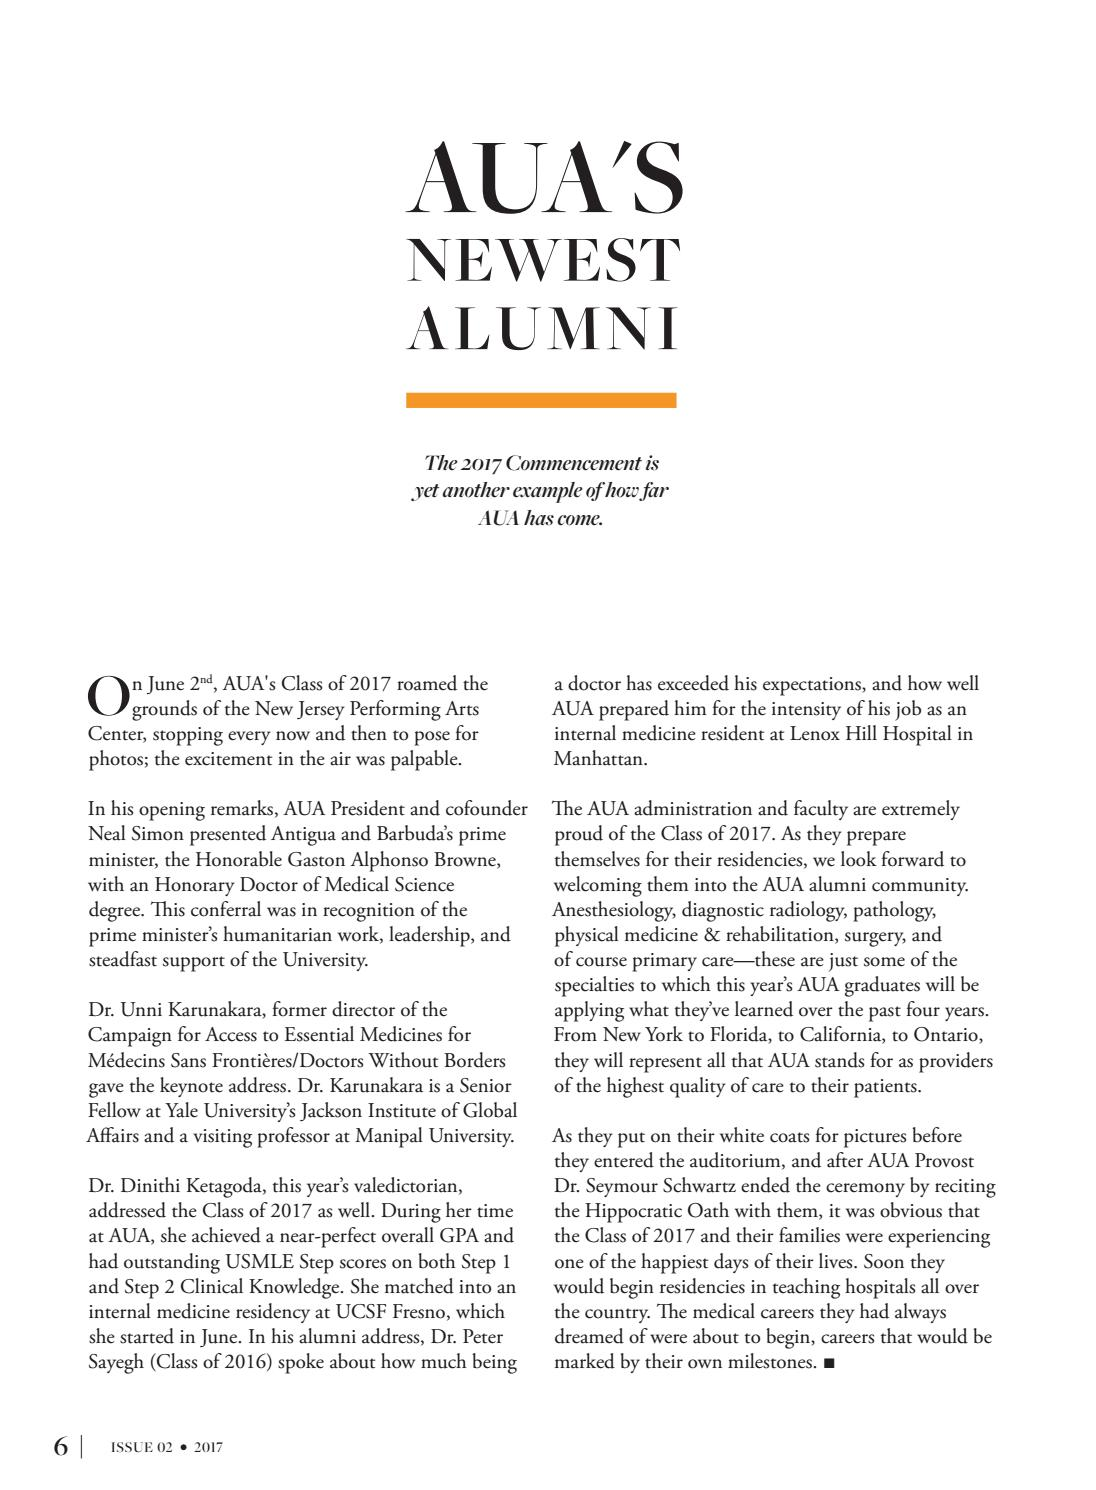 Alumni Magazine Issue 02_2017 by AUAmed - issuu